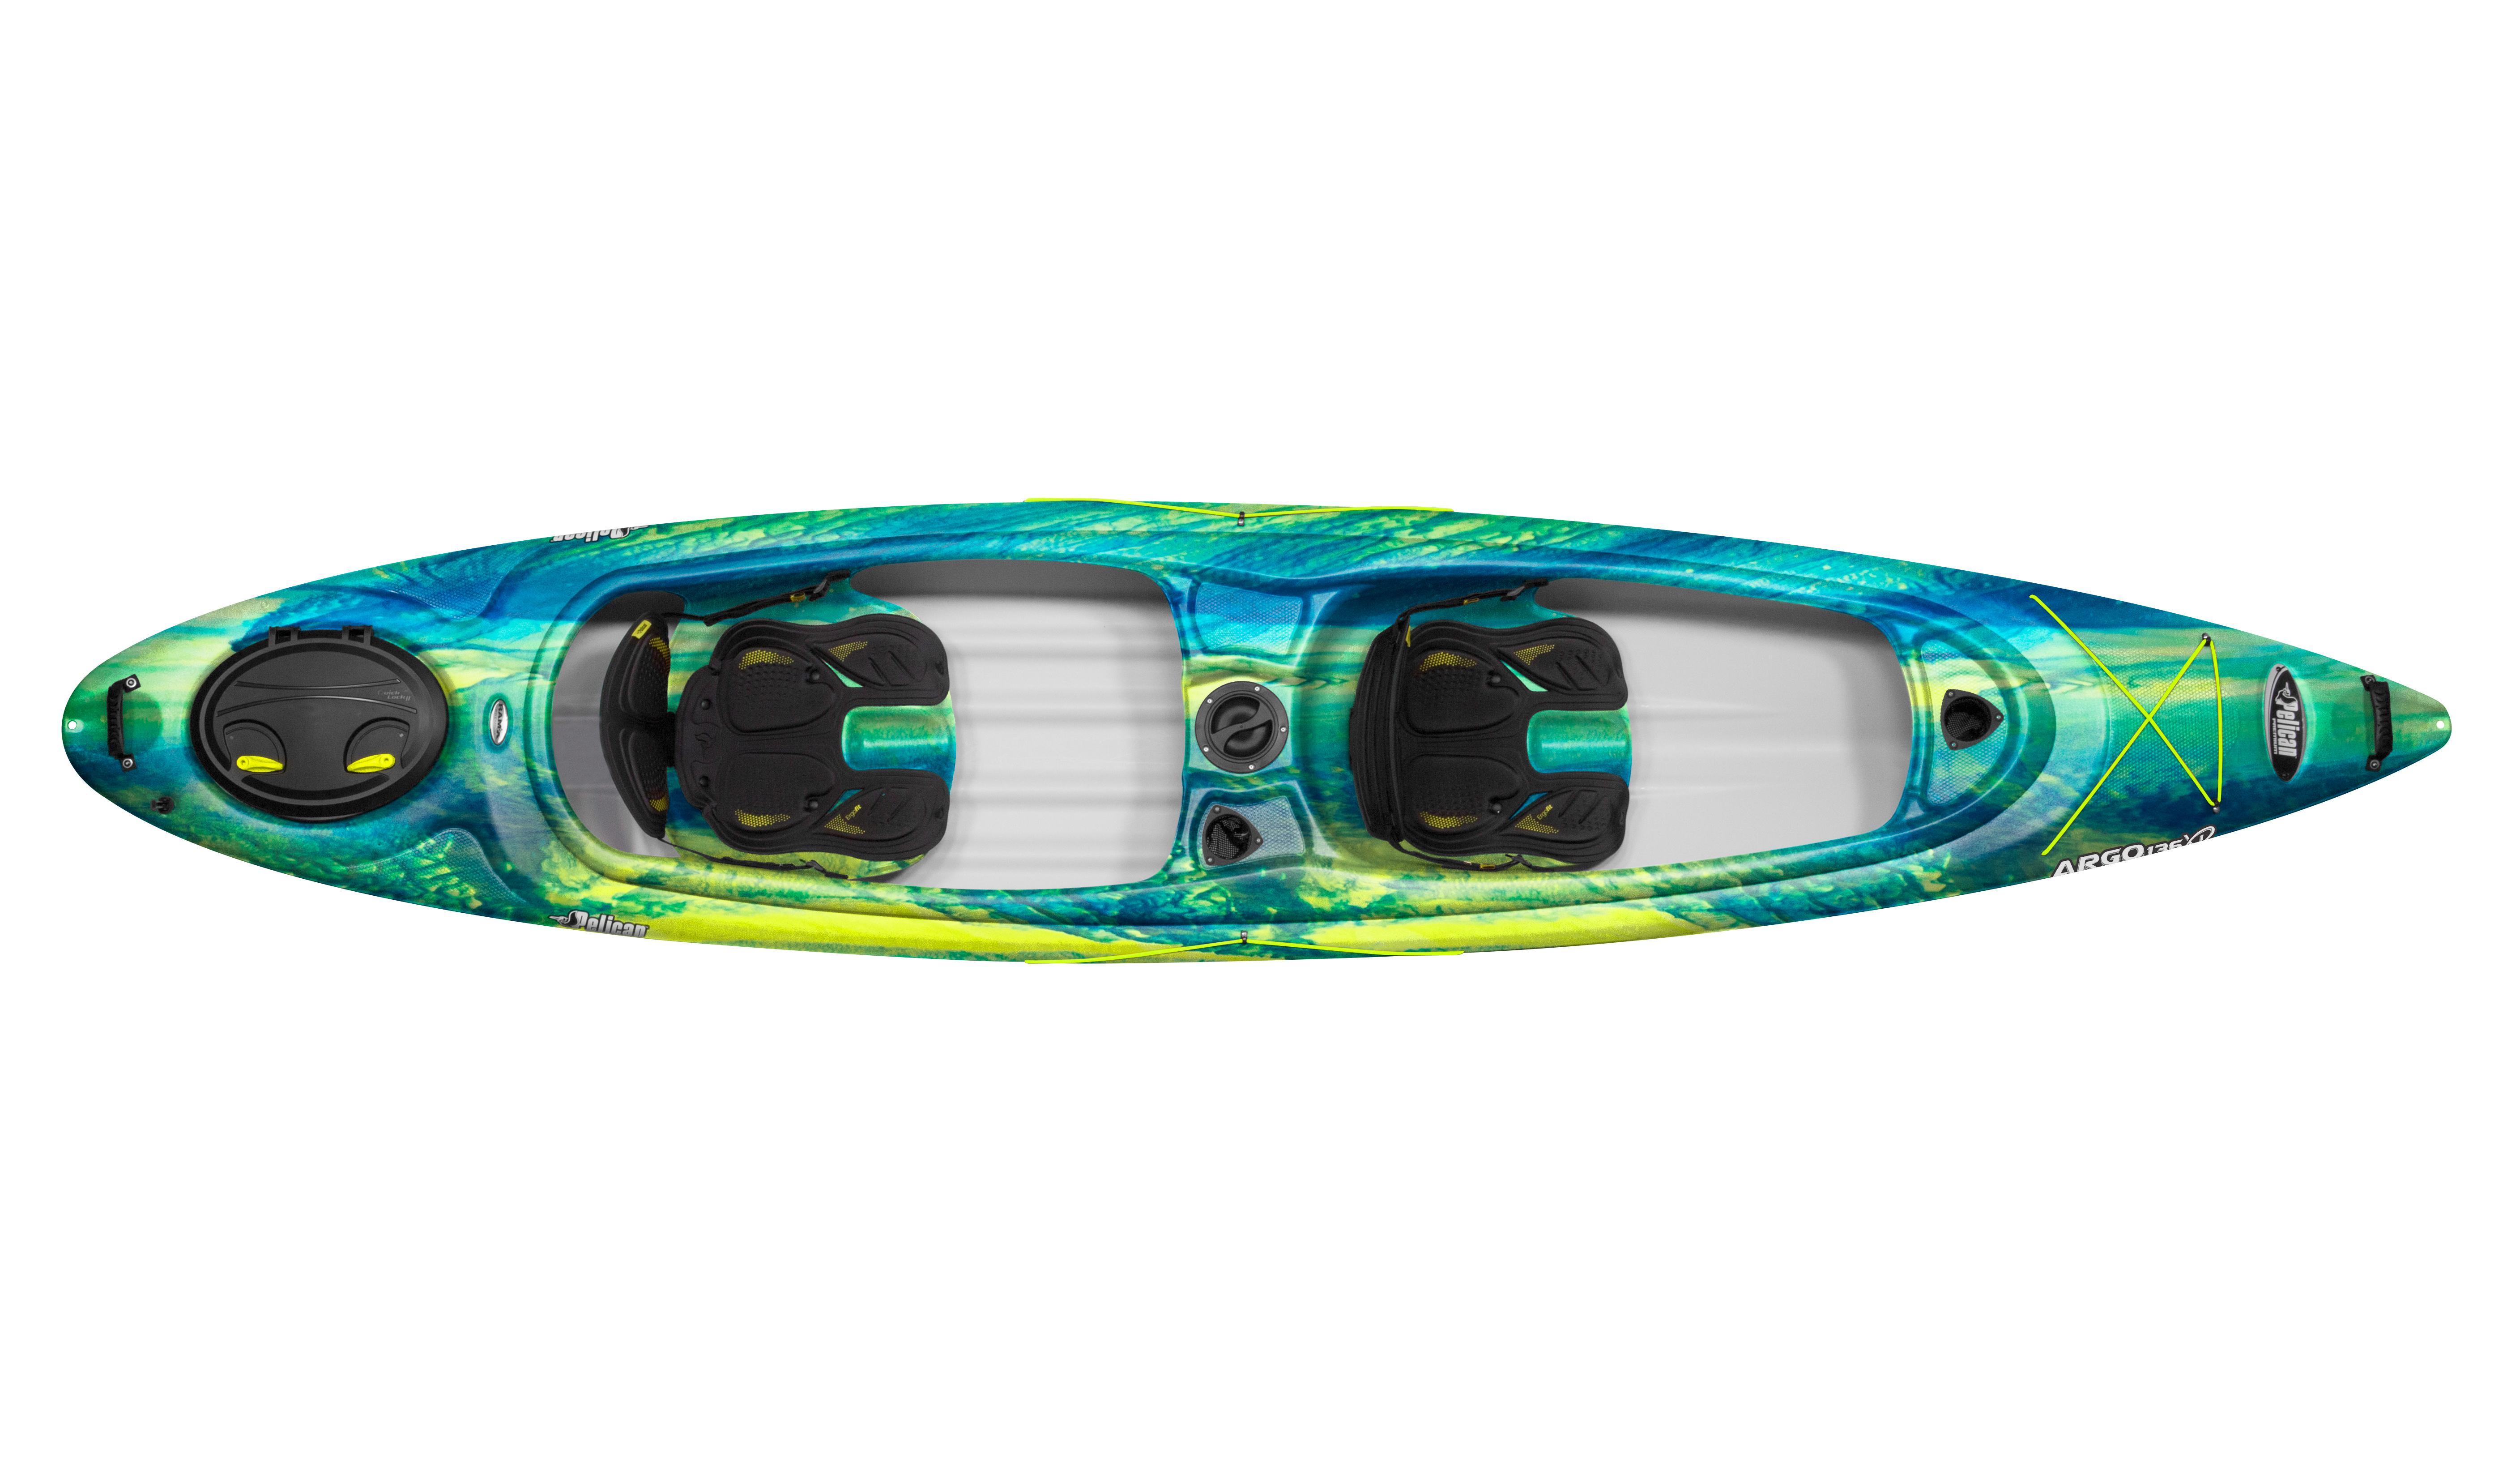 Kayaks: Argo 136XP by Pelican Premium - Image 4625